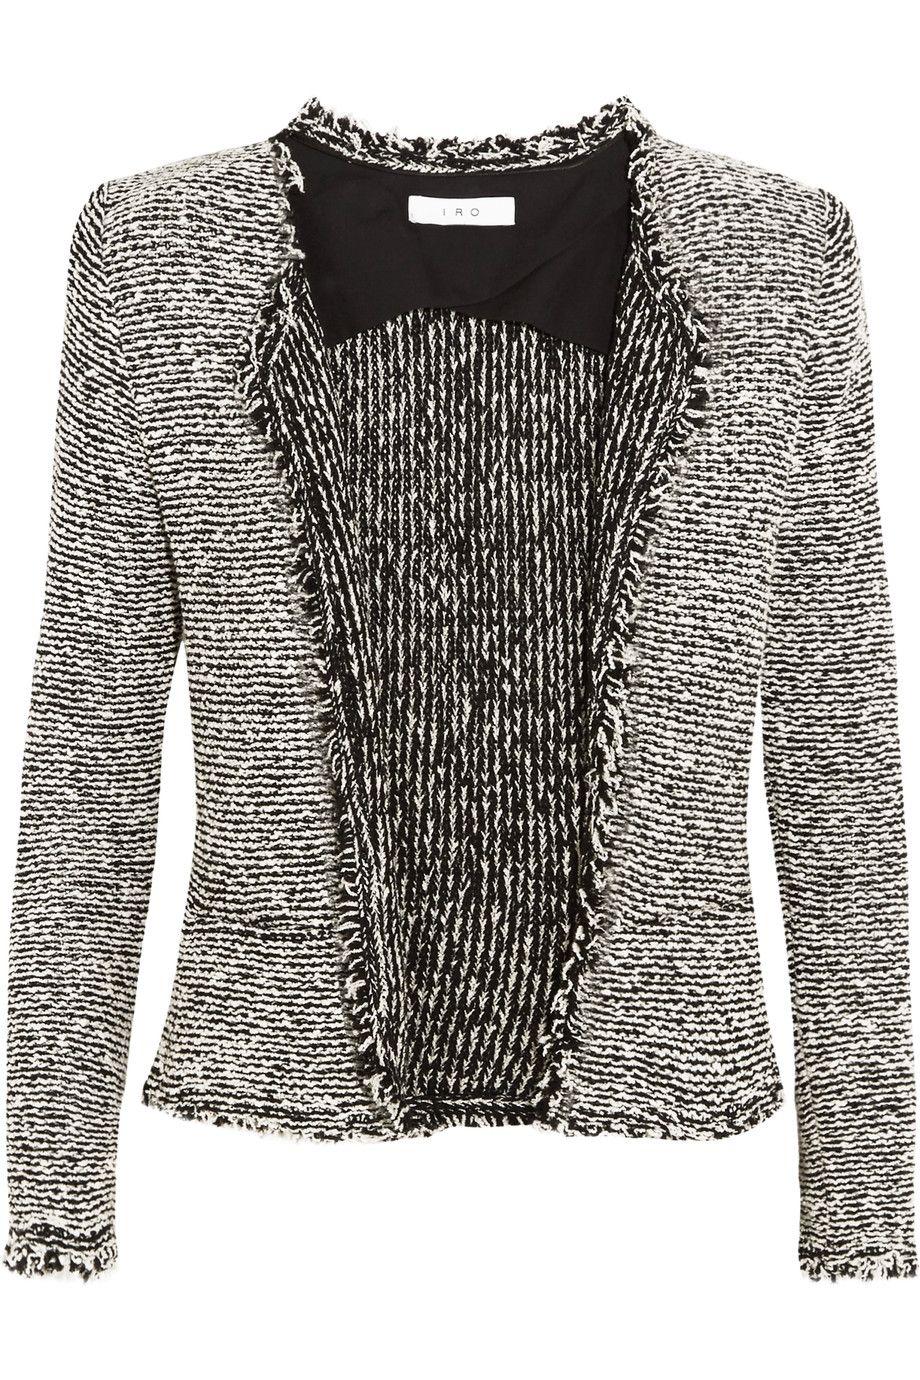 Azure Frayed Cottonblend Bouclé Jacket Boucle jacket